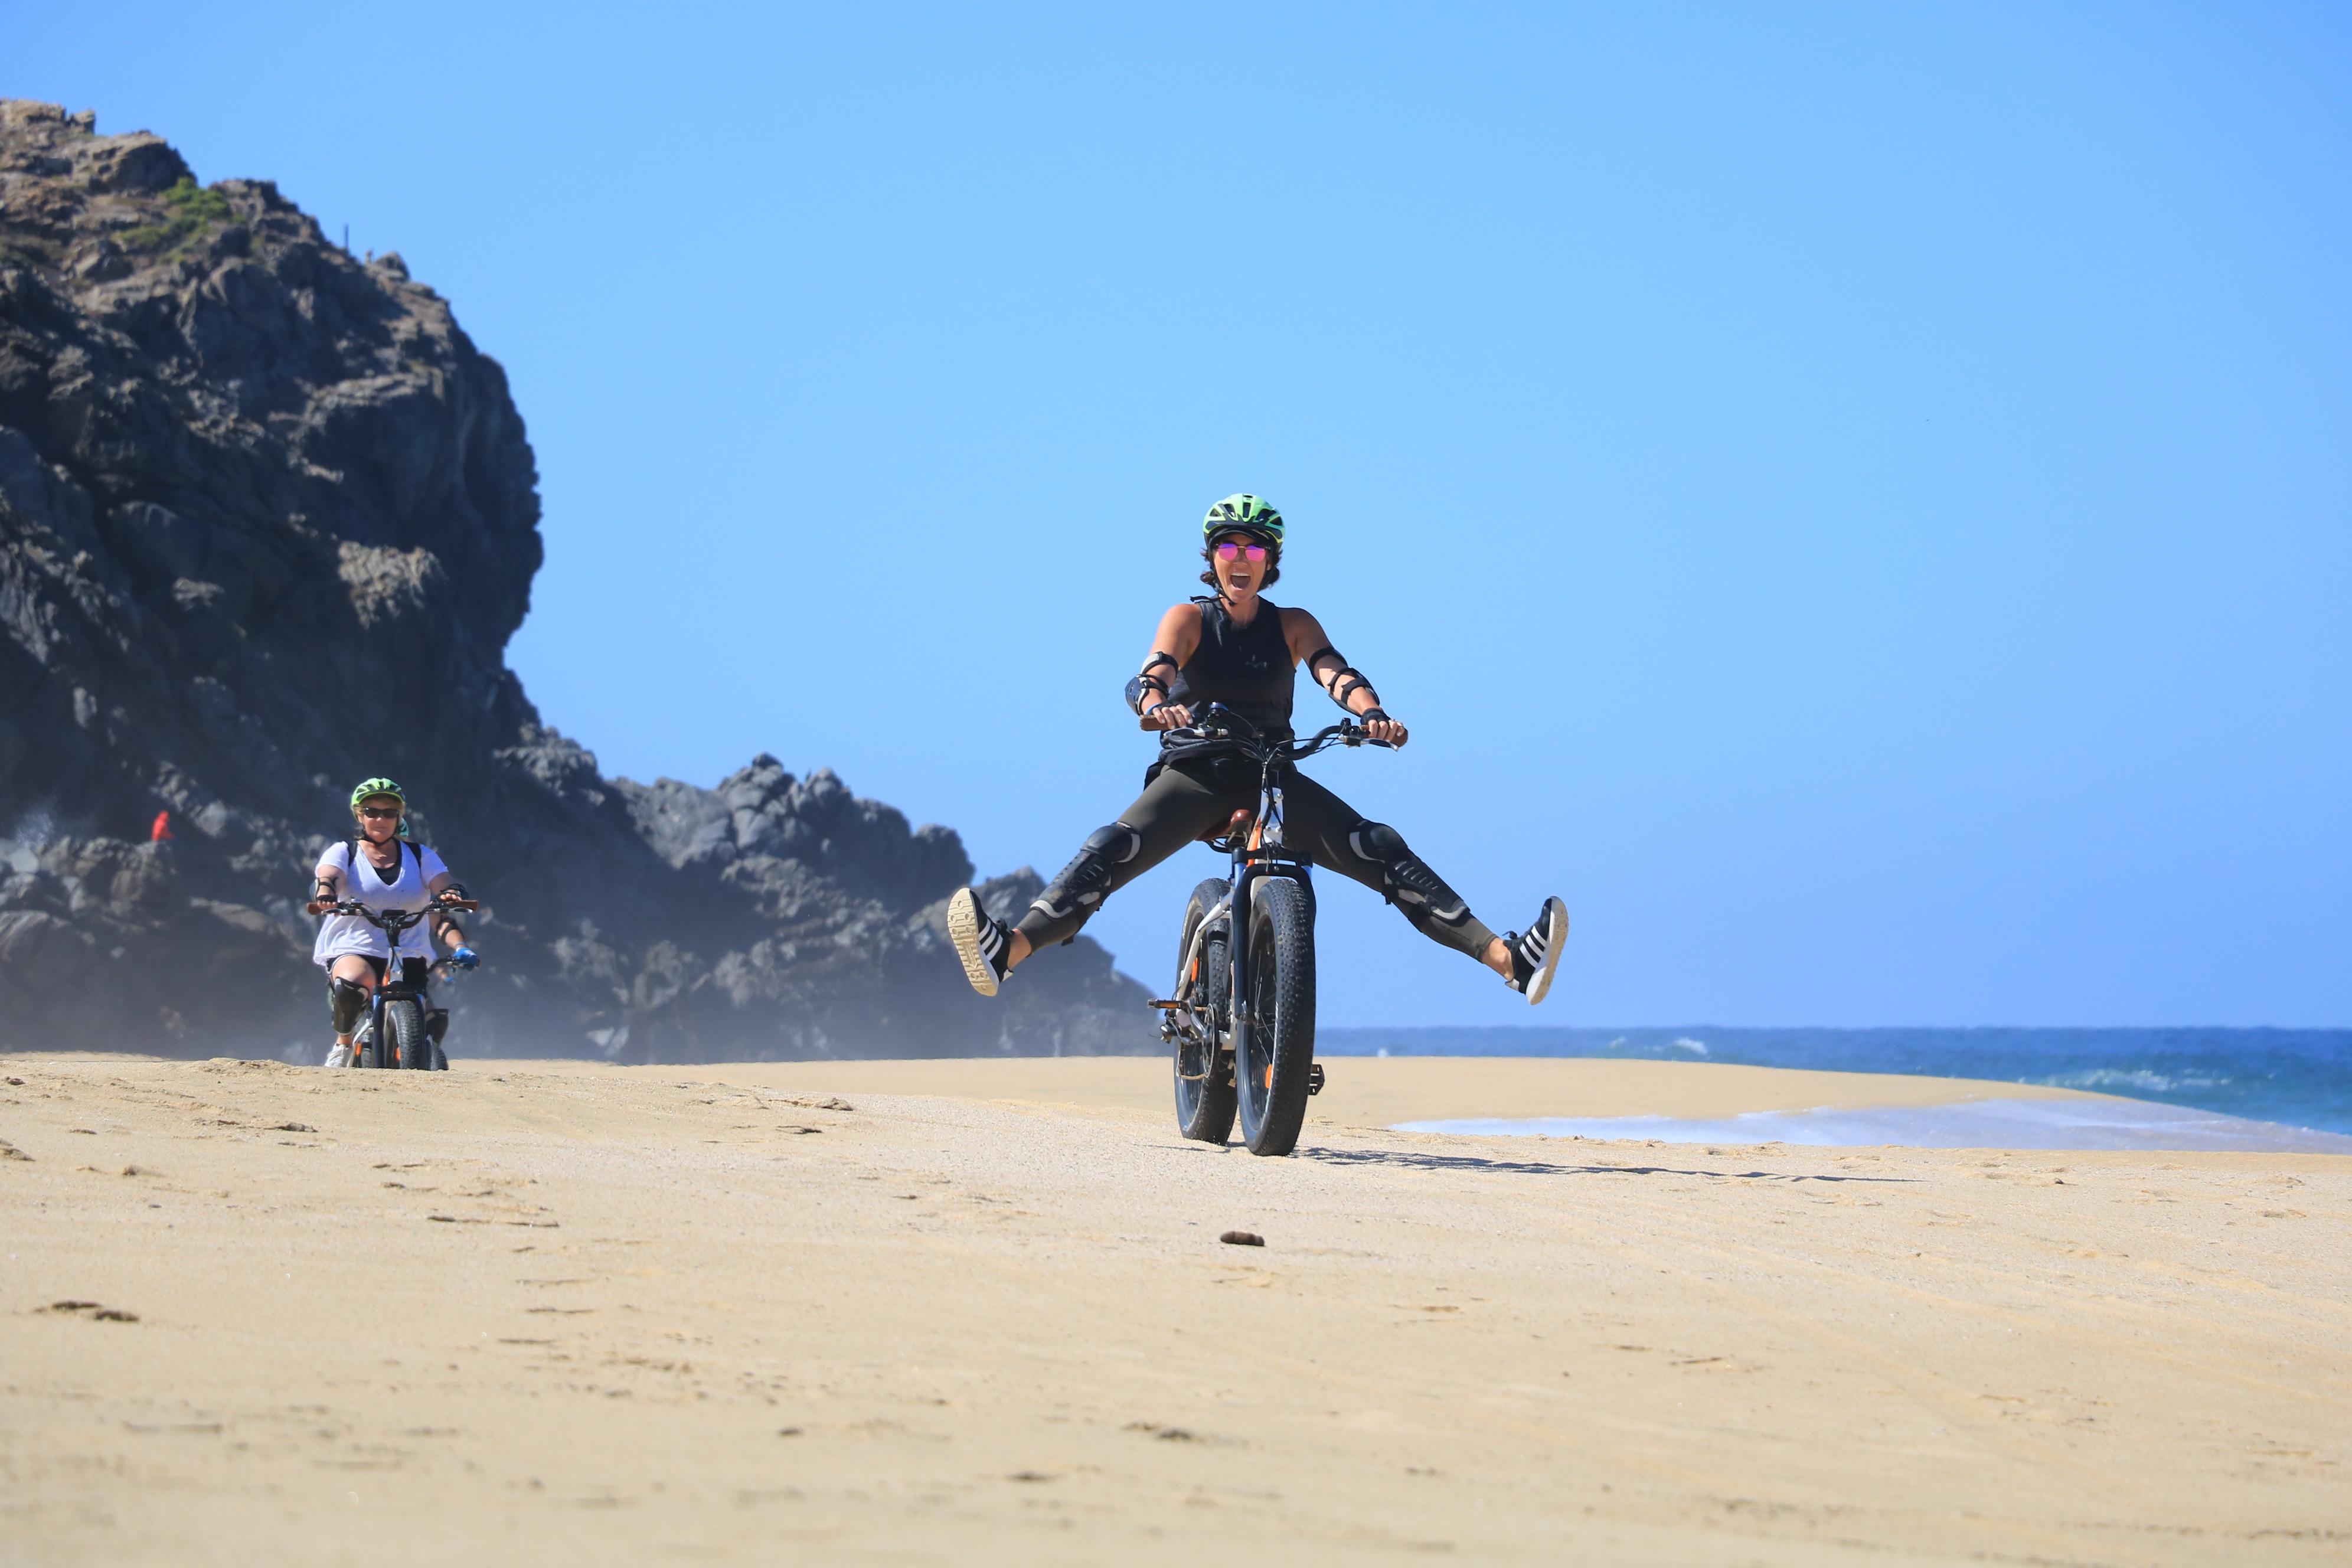 Electric Bike Beach Adventure